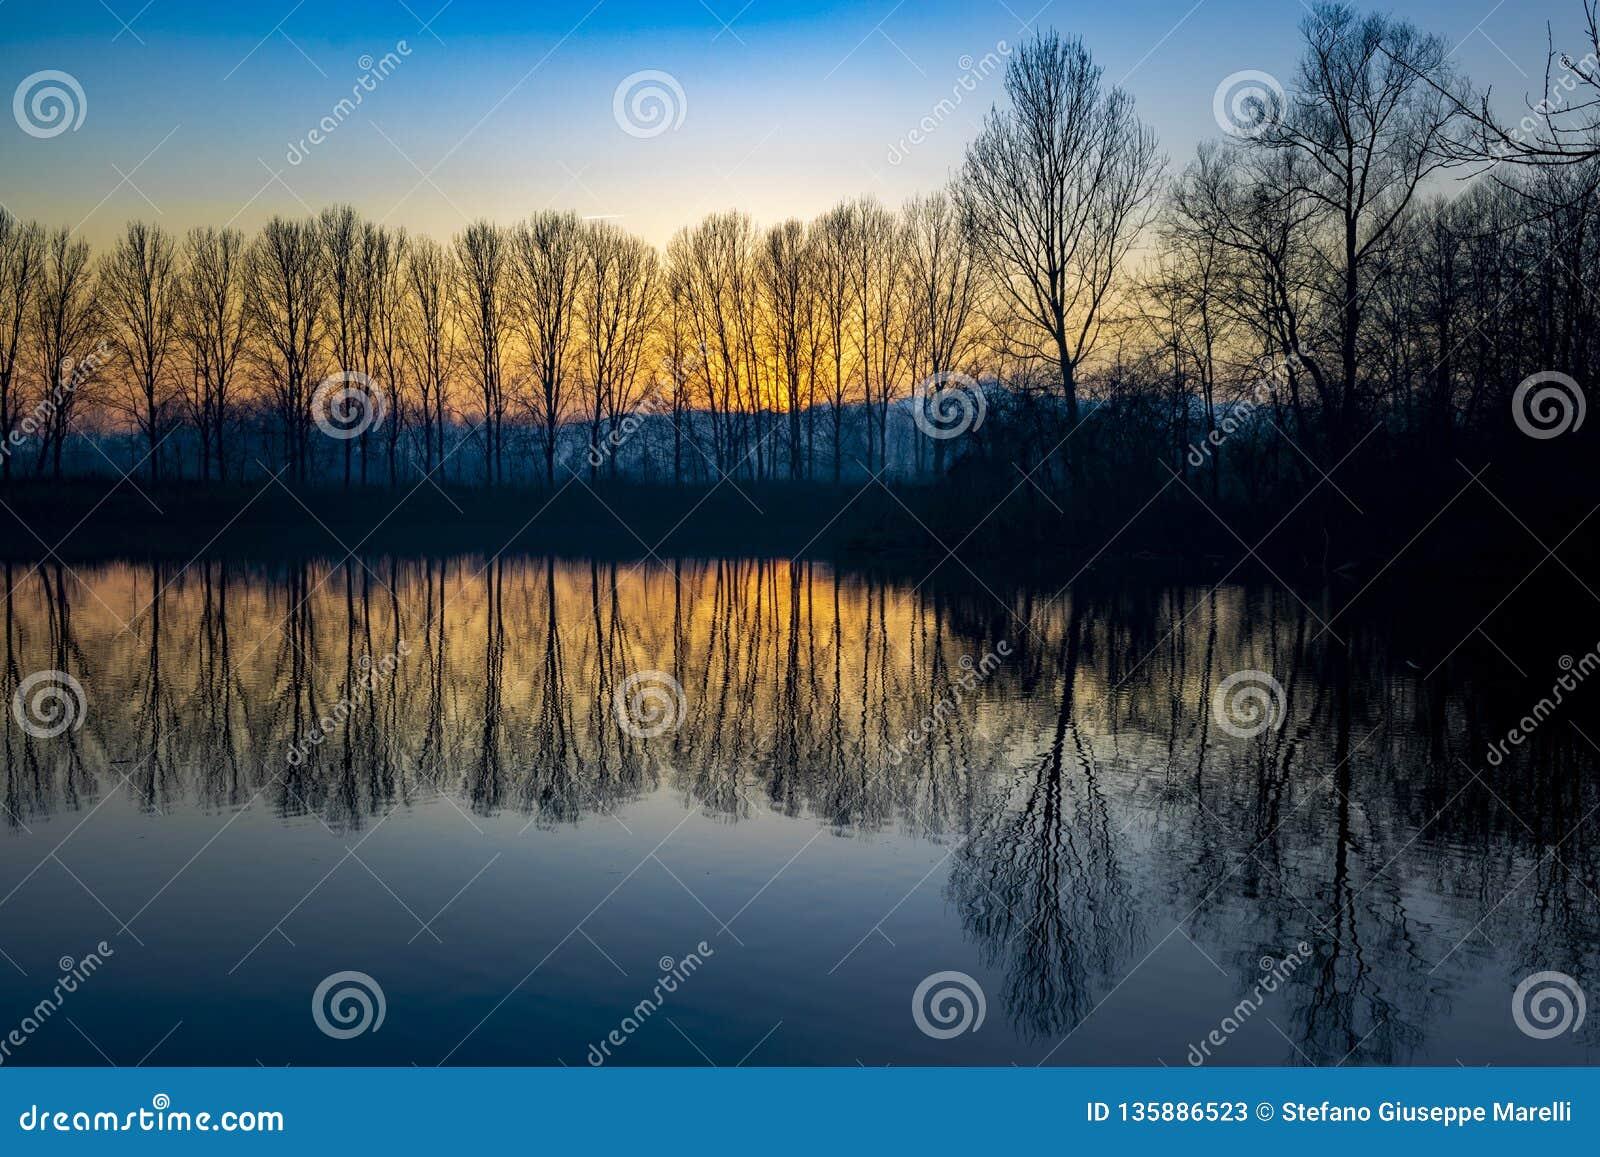 Пьемонт, Италия, прибрежная полоса озера на заходе солнца, в парке реки po